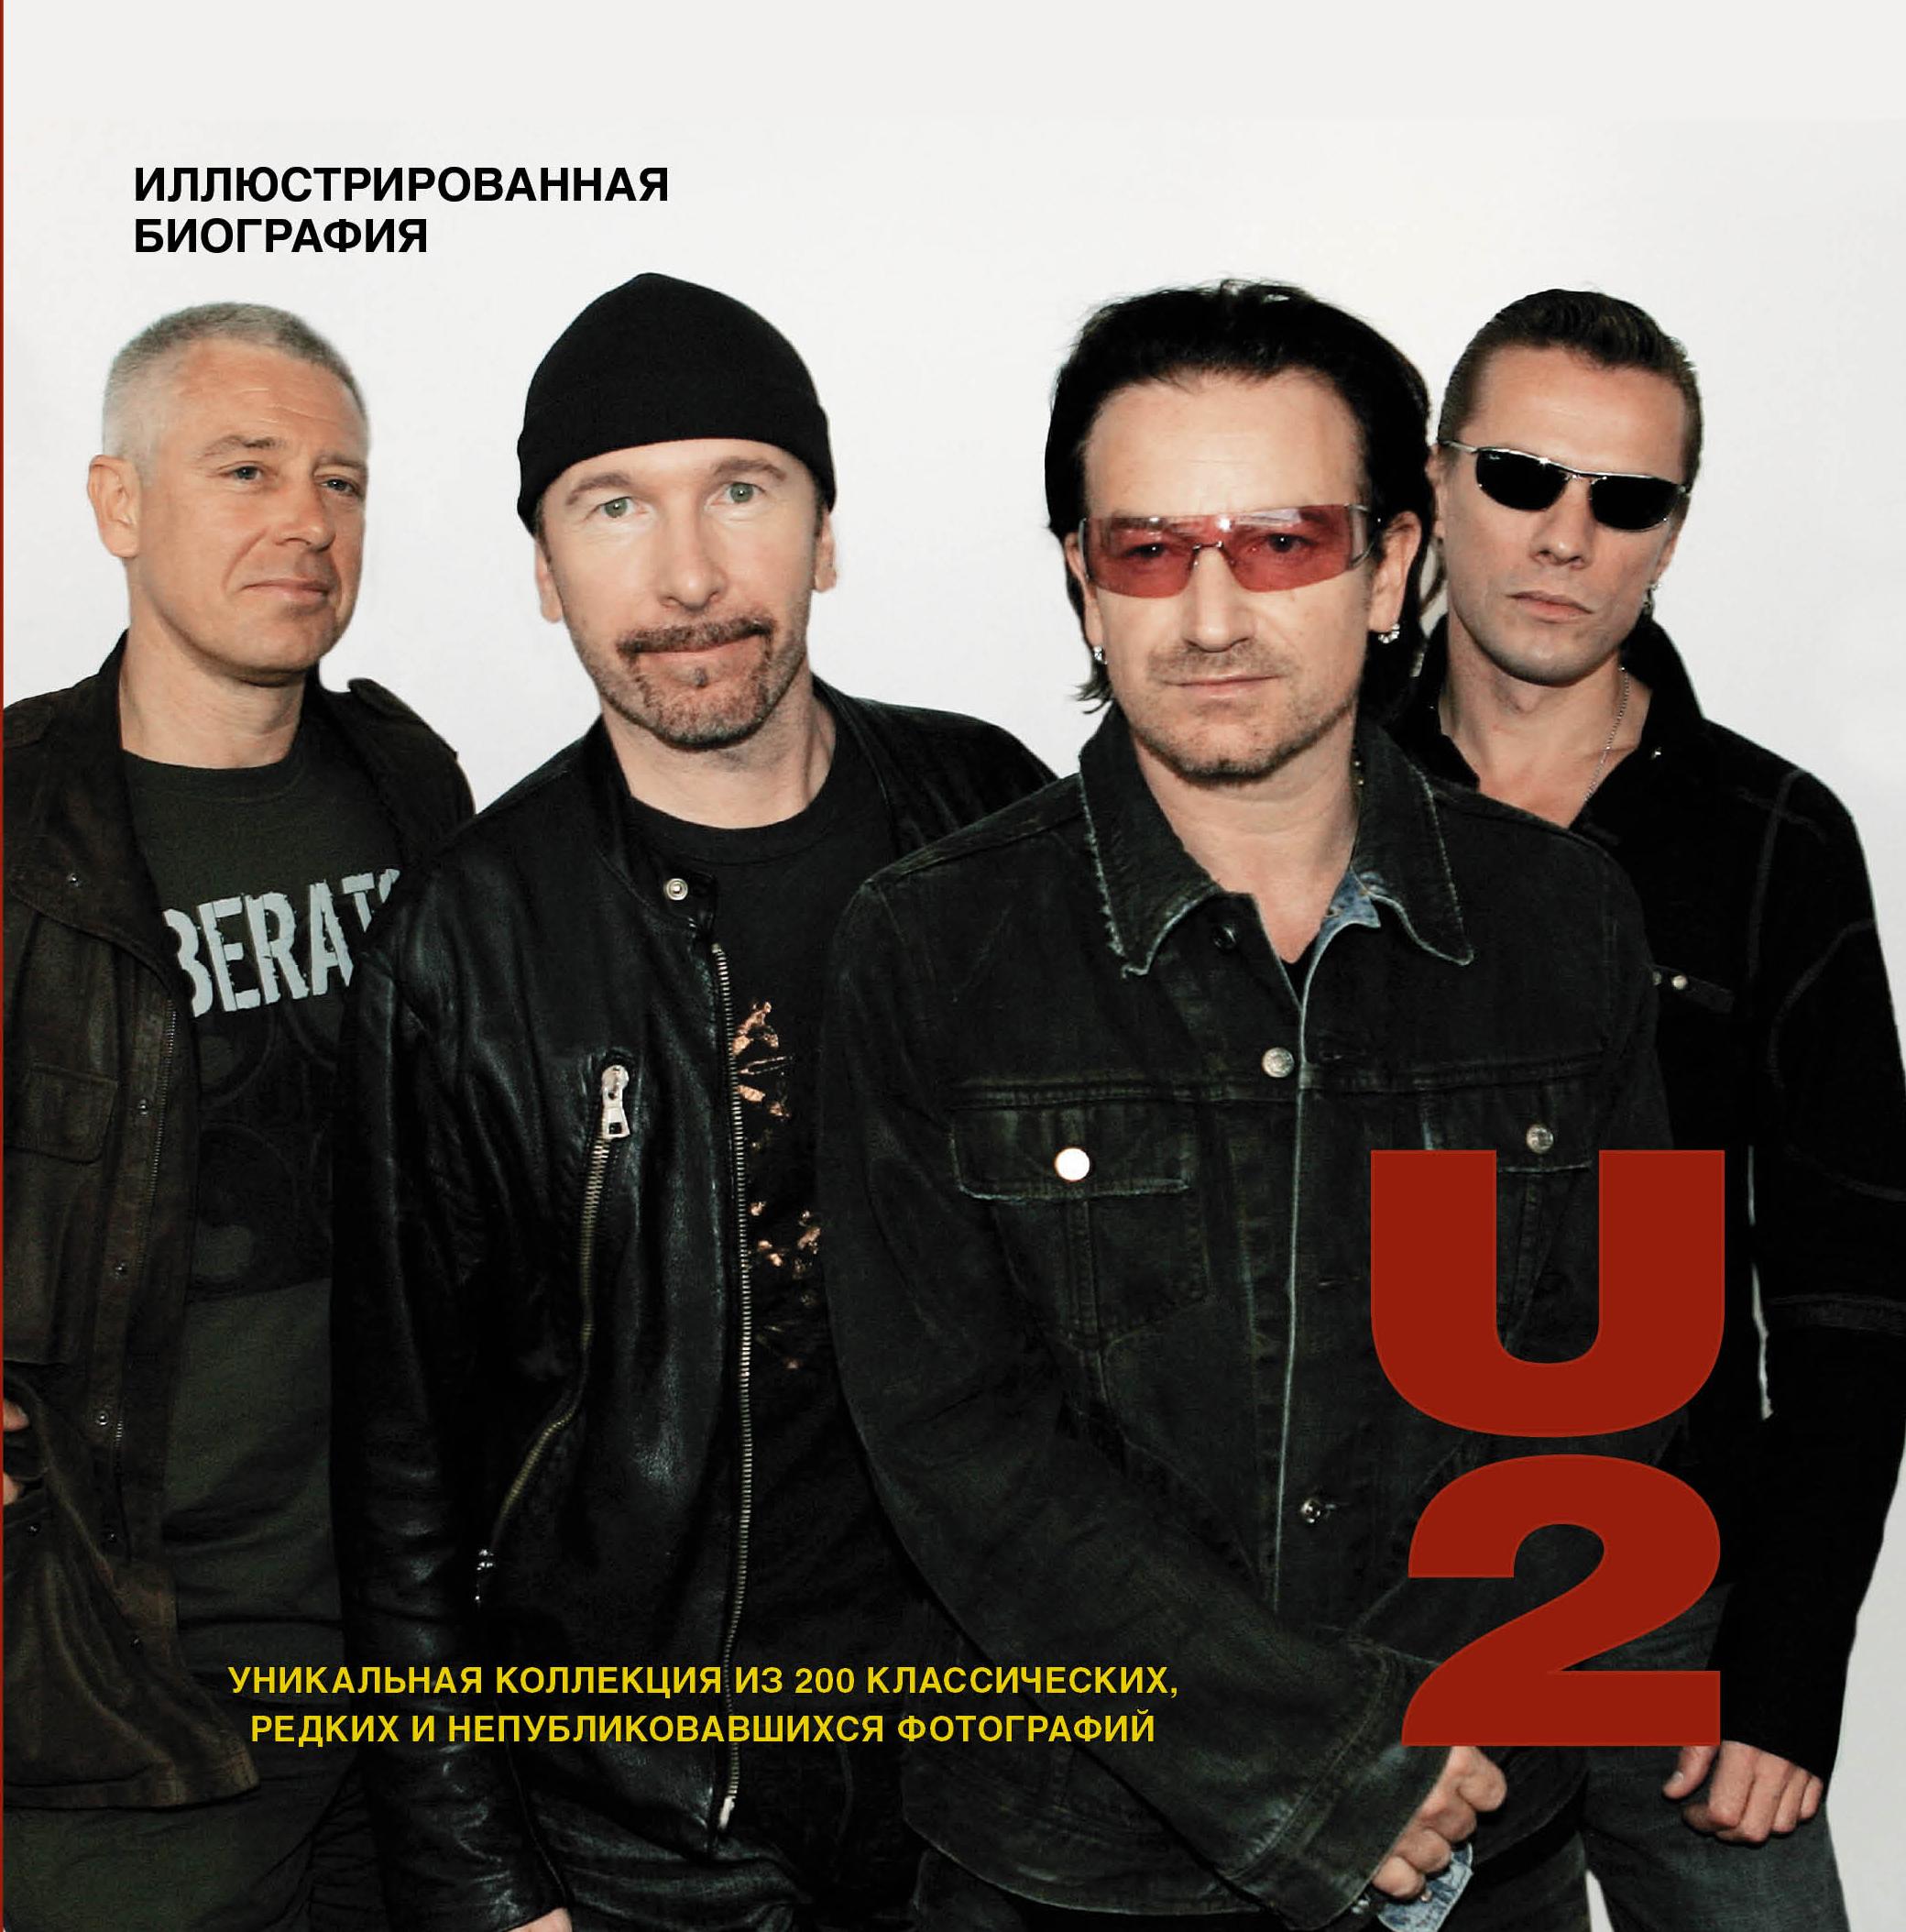 U2. Иллюстрированная биография ( Андерсен Мартин  )